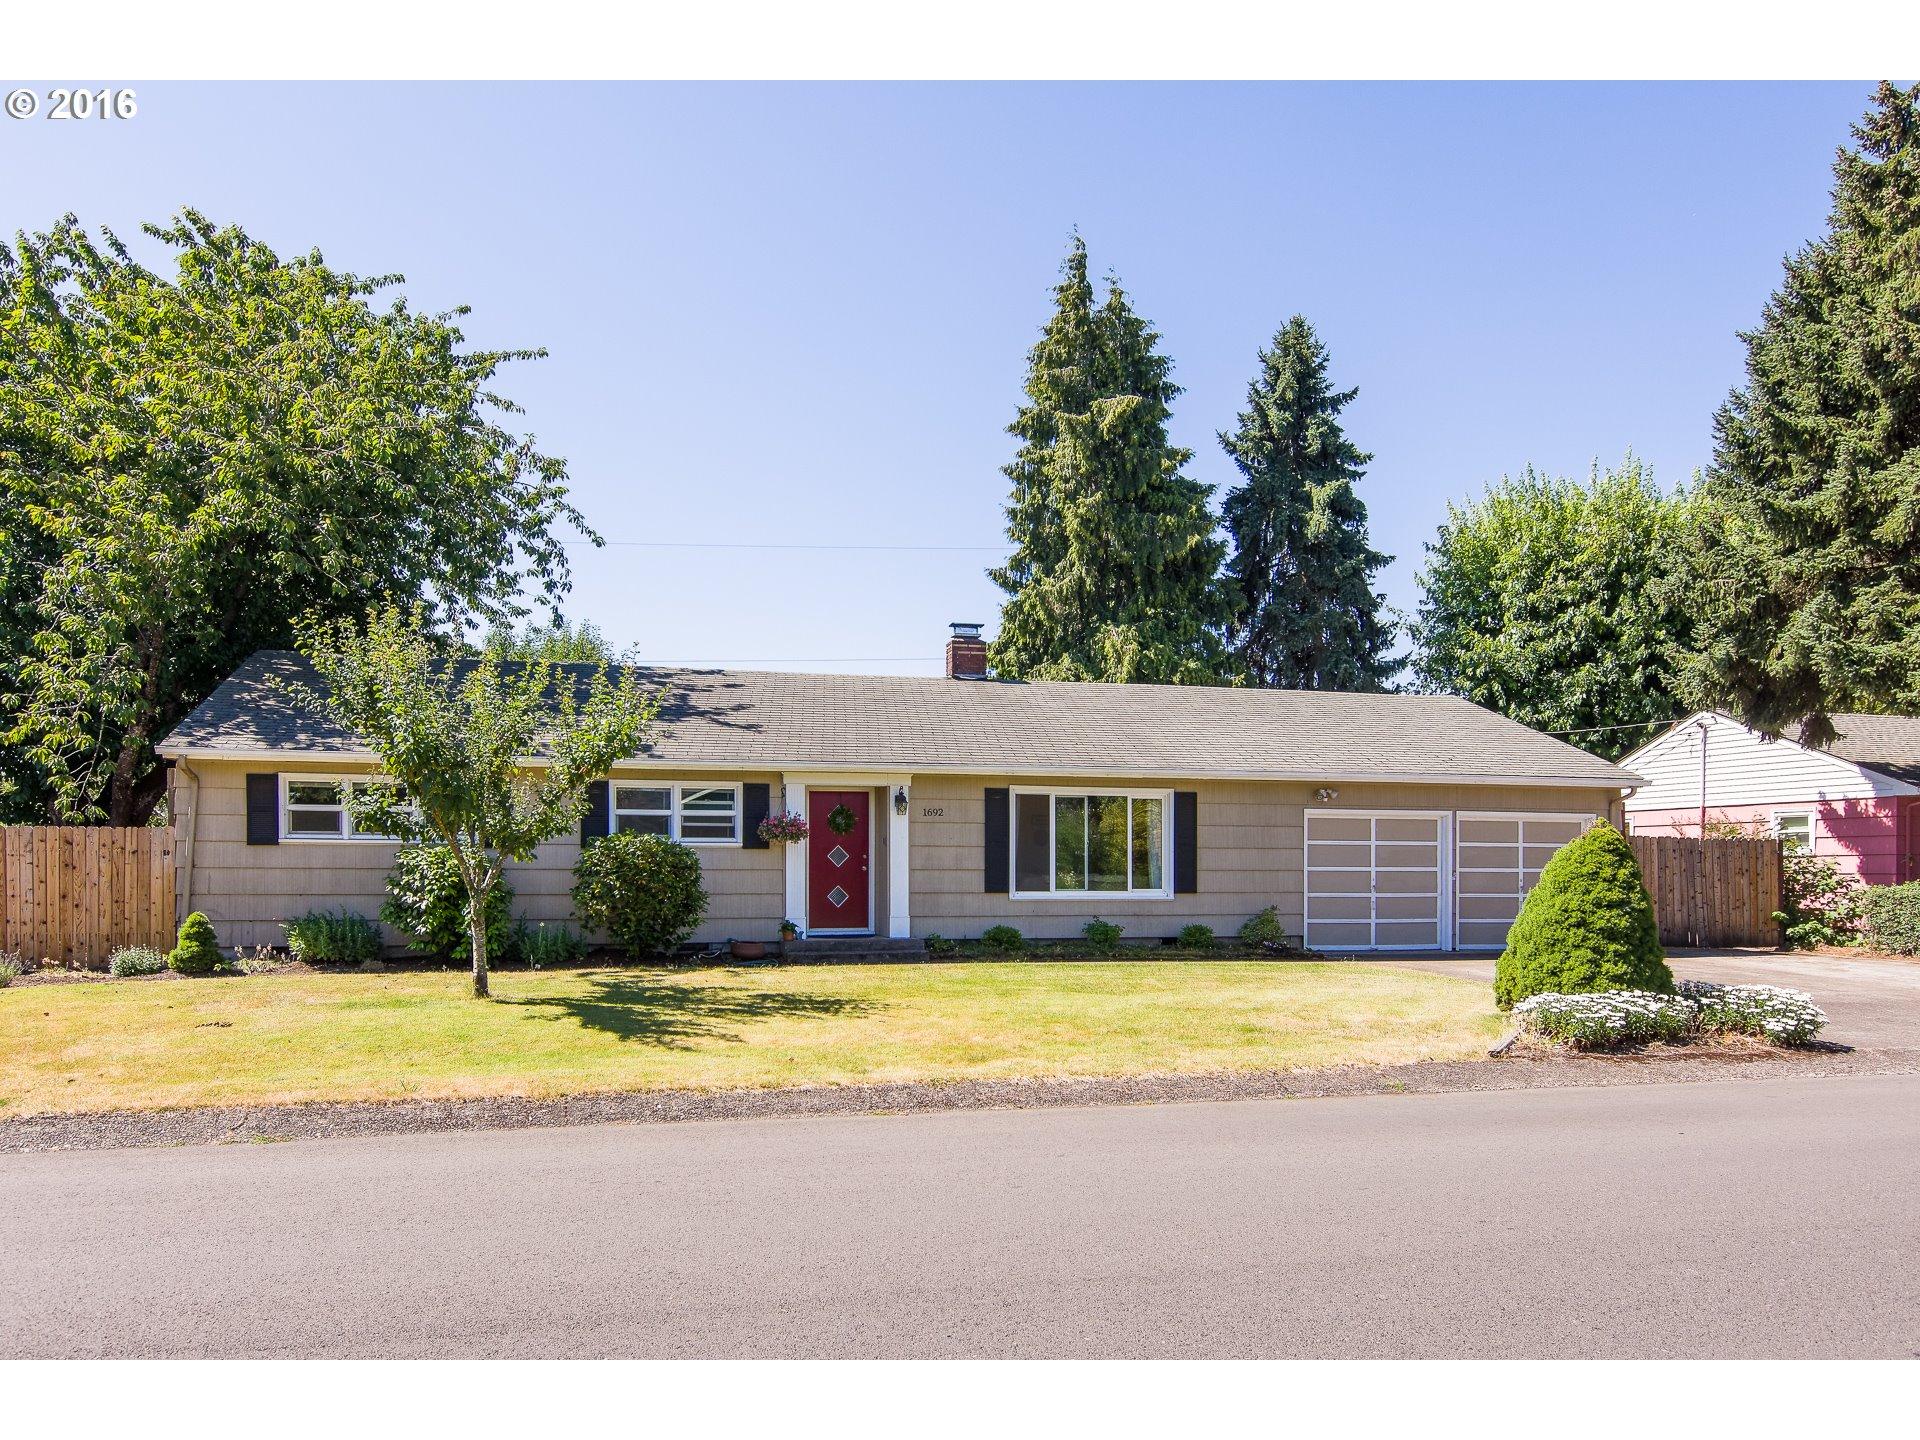 1692 BREWER AVE, Eugene, OR 97401